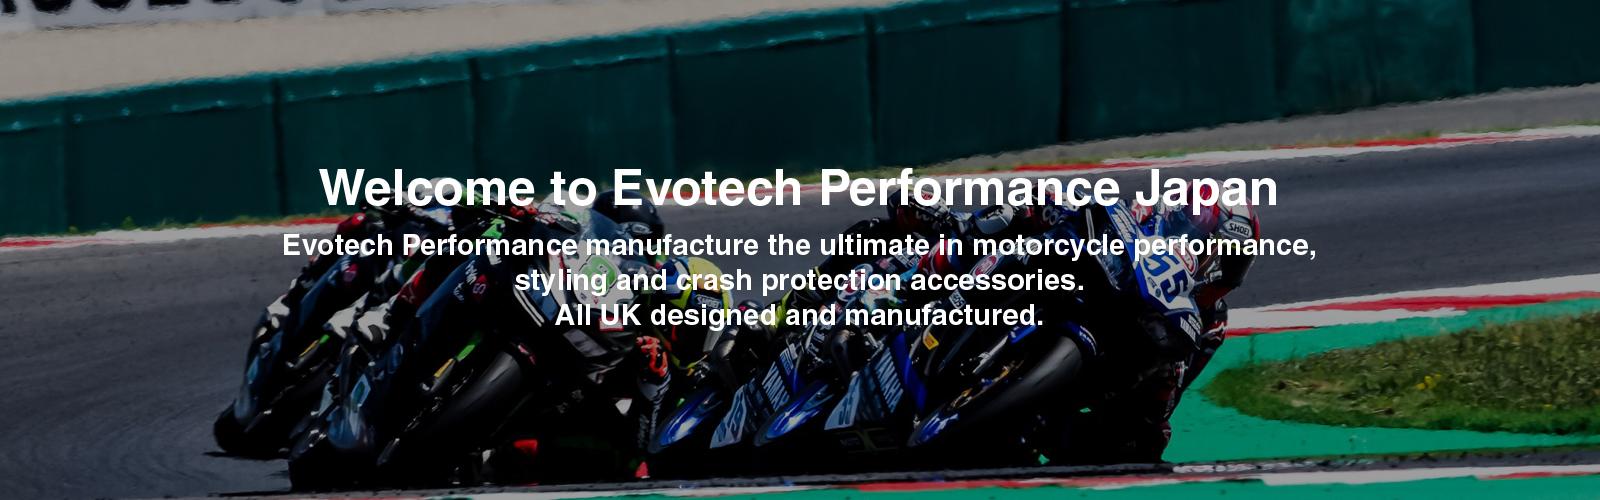 Evotech Performance U.K社 日本正規総輸入代理店 モーターサイクルパーツ Ducati Panigale V4 R